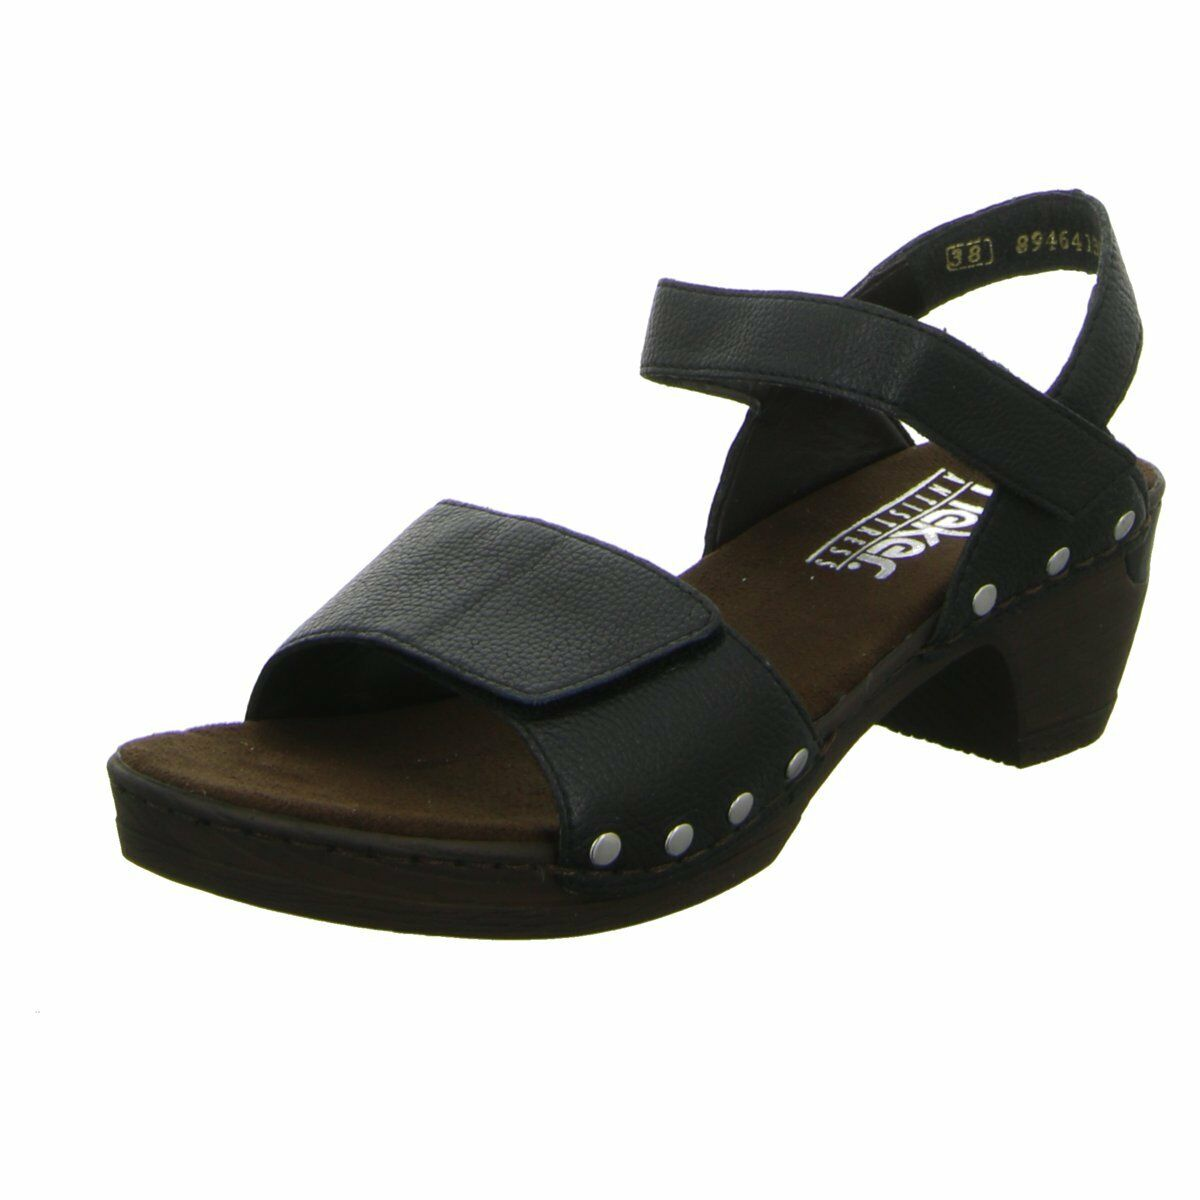 NEU Rieker Damen Sandaletten Sandalette eleganter Boden 66863-01 schwarz 133341